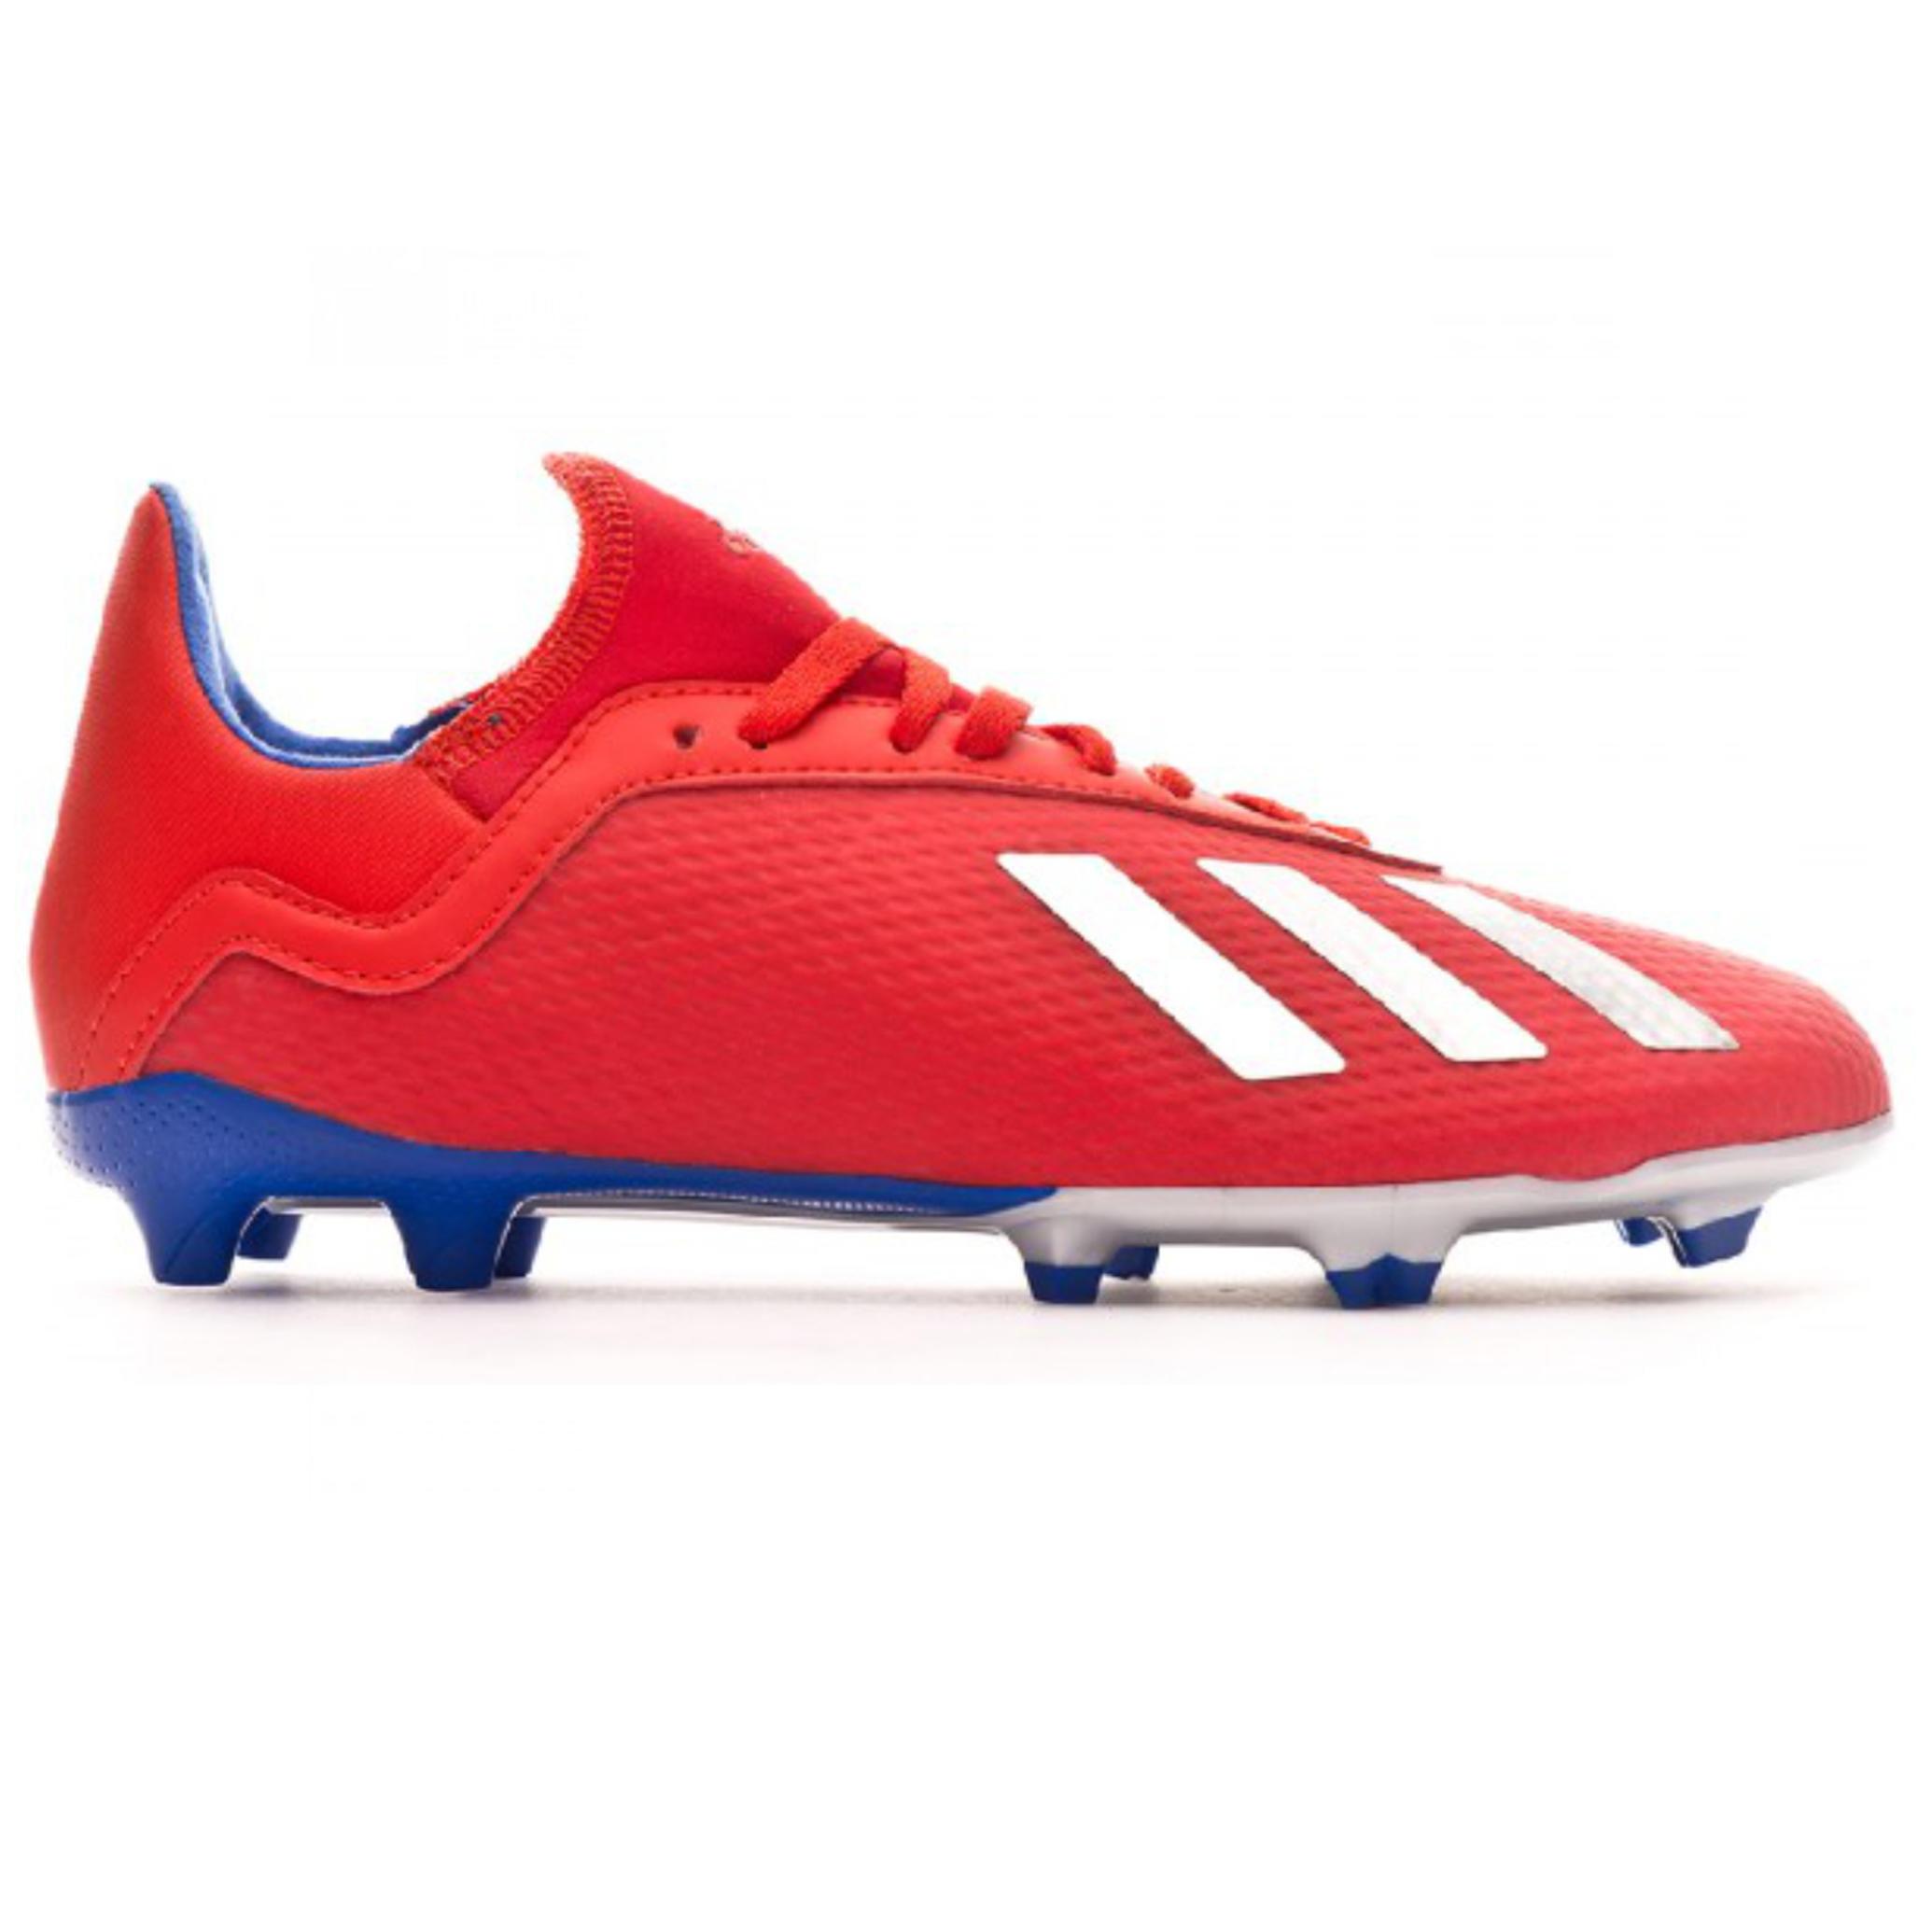 Adidas Voetbalschoenen X 18.3 FG rood